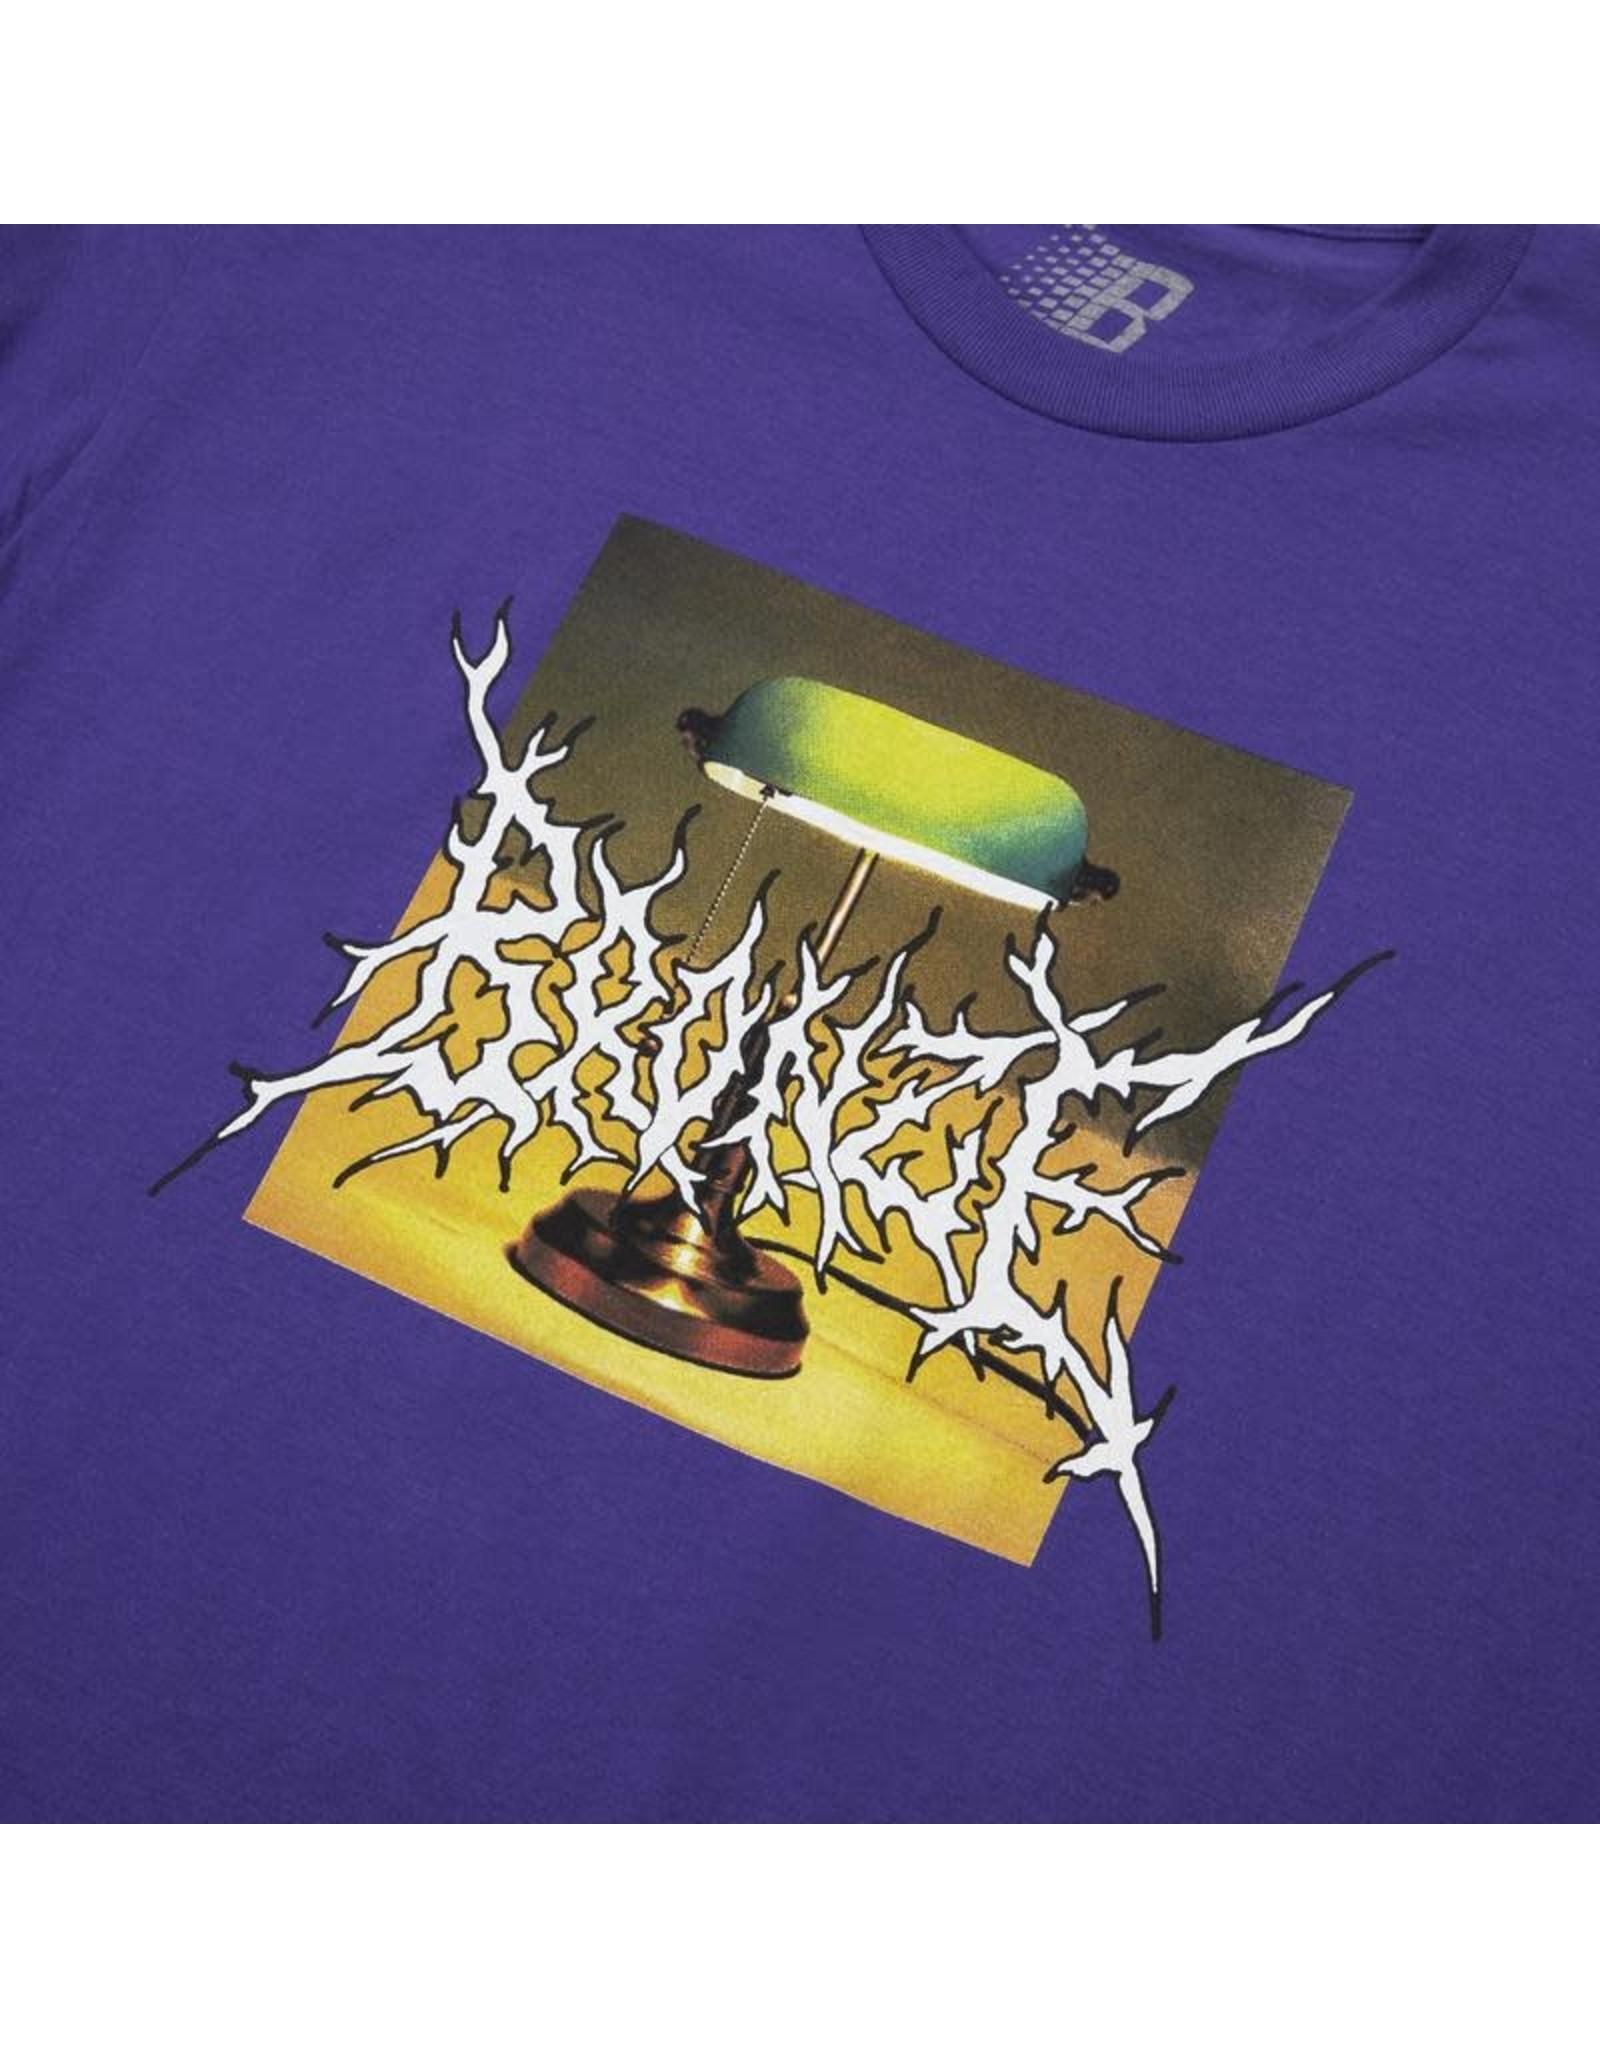 Bronze56K Death Metal Lamp Tee - Purple